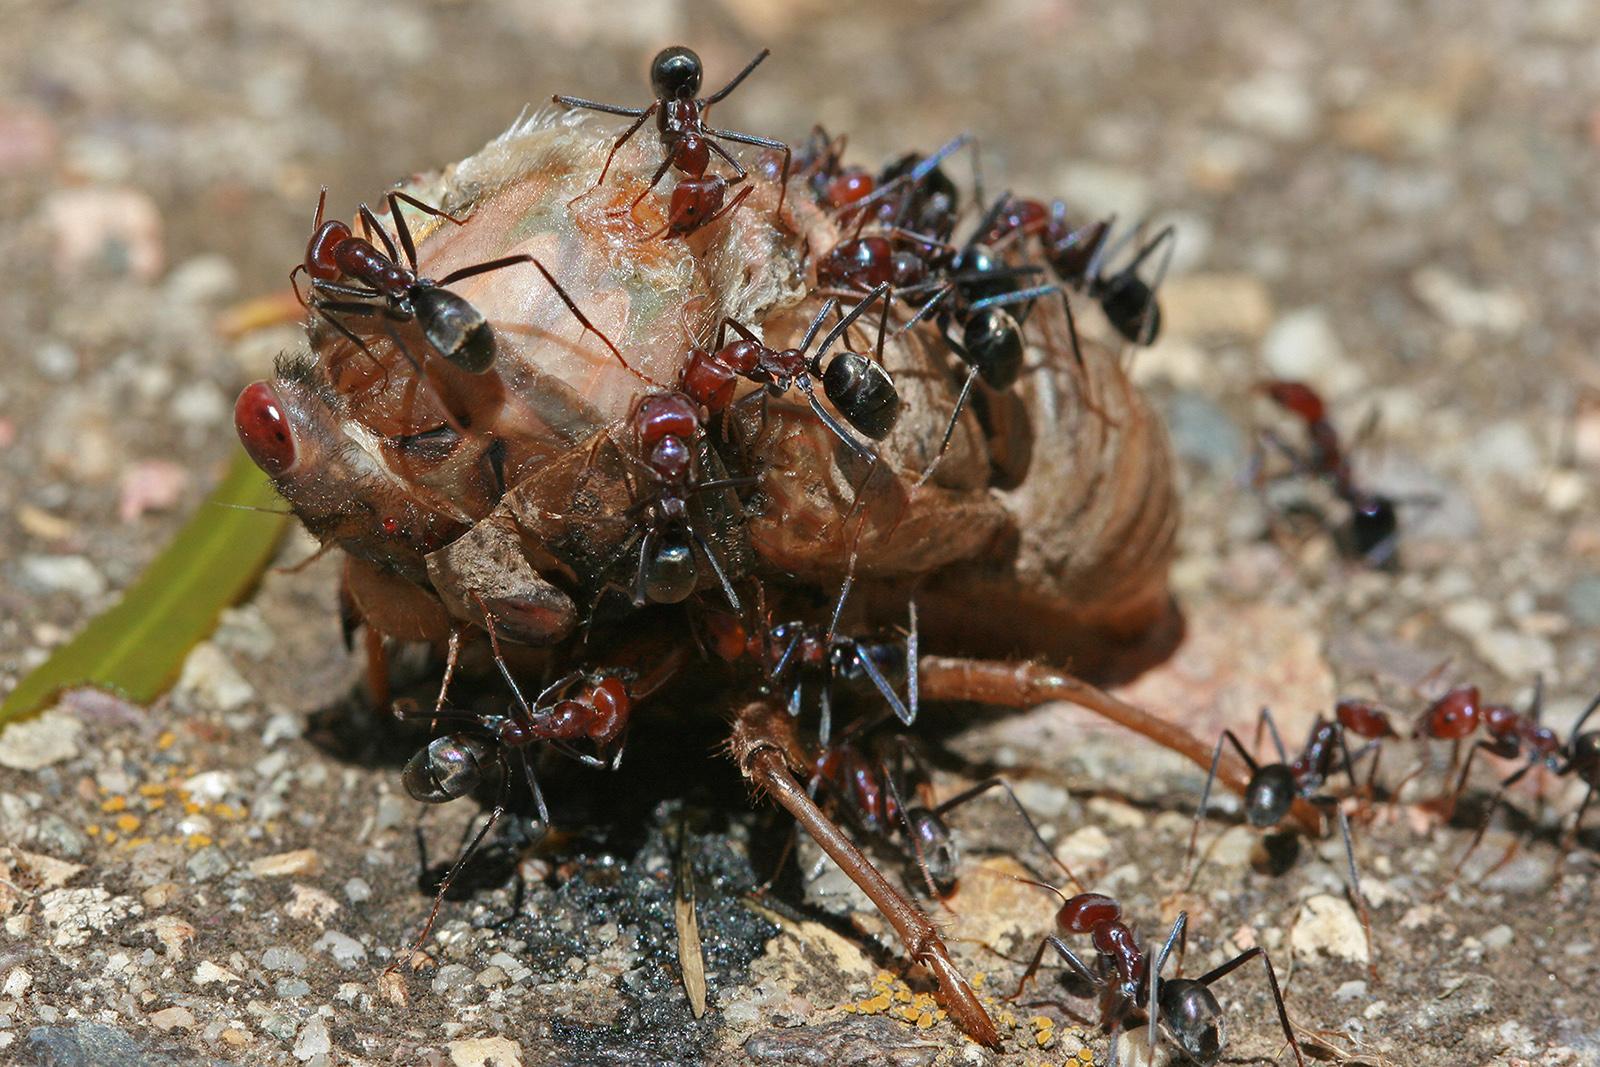 Description ants eating cicada jjron 22 11 2009